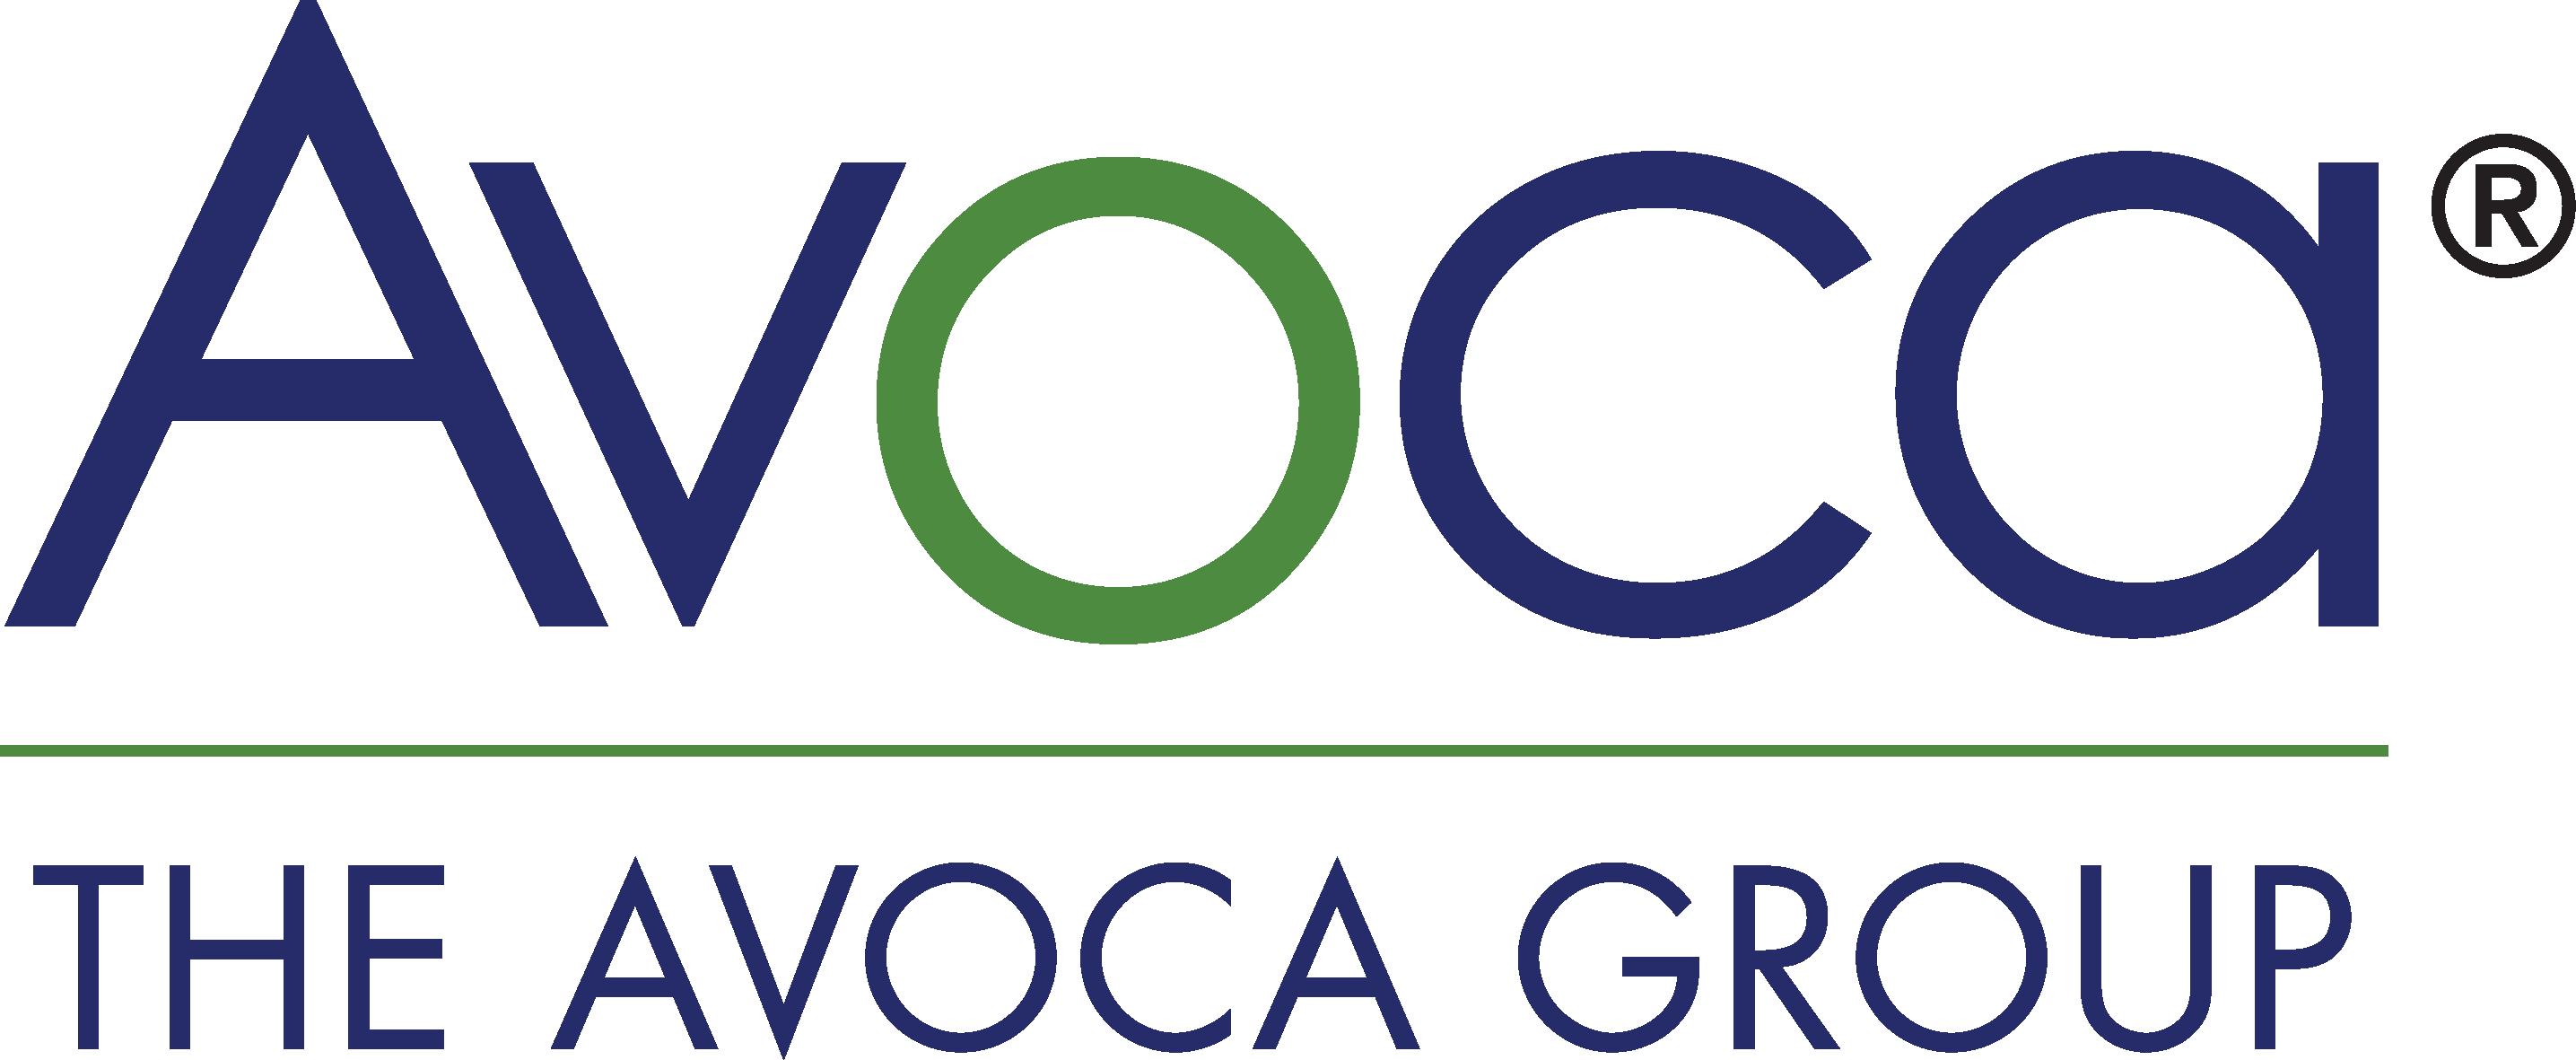 The Avoca Group